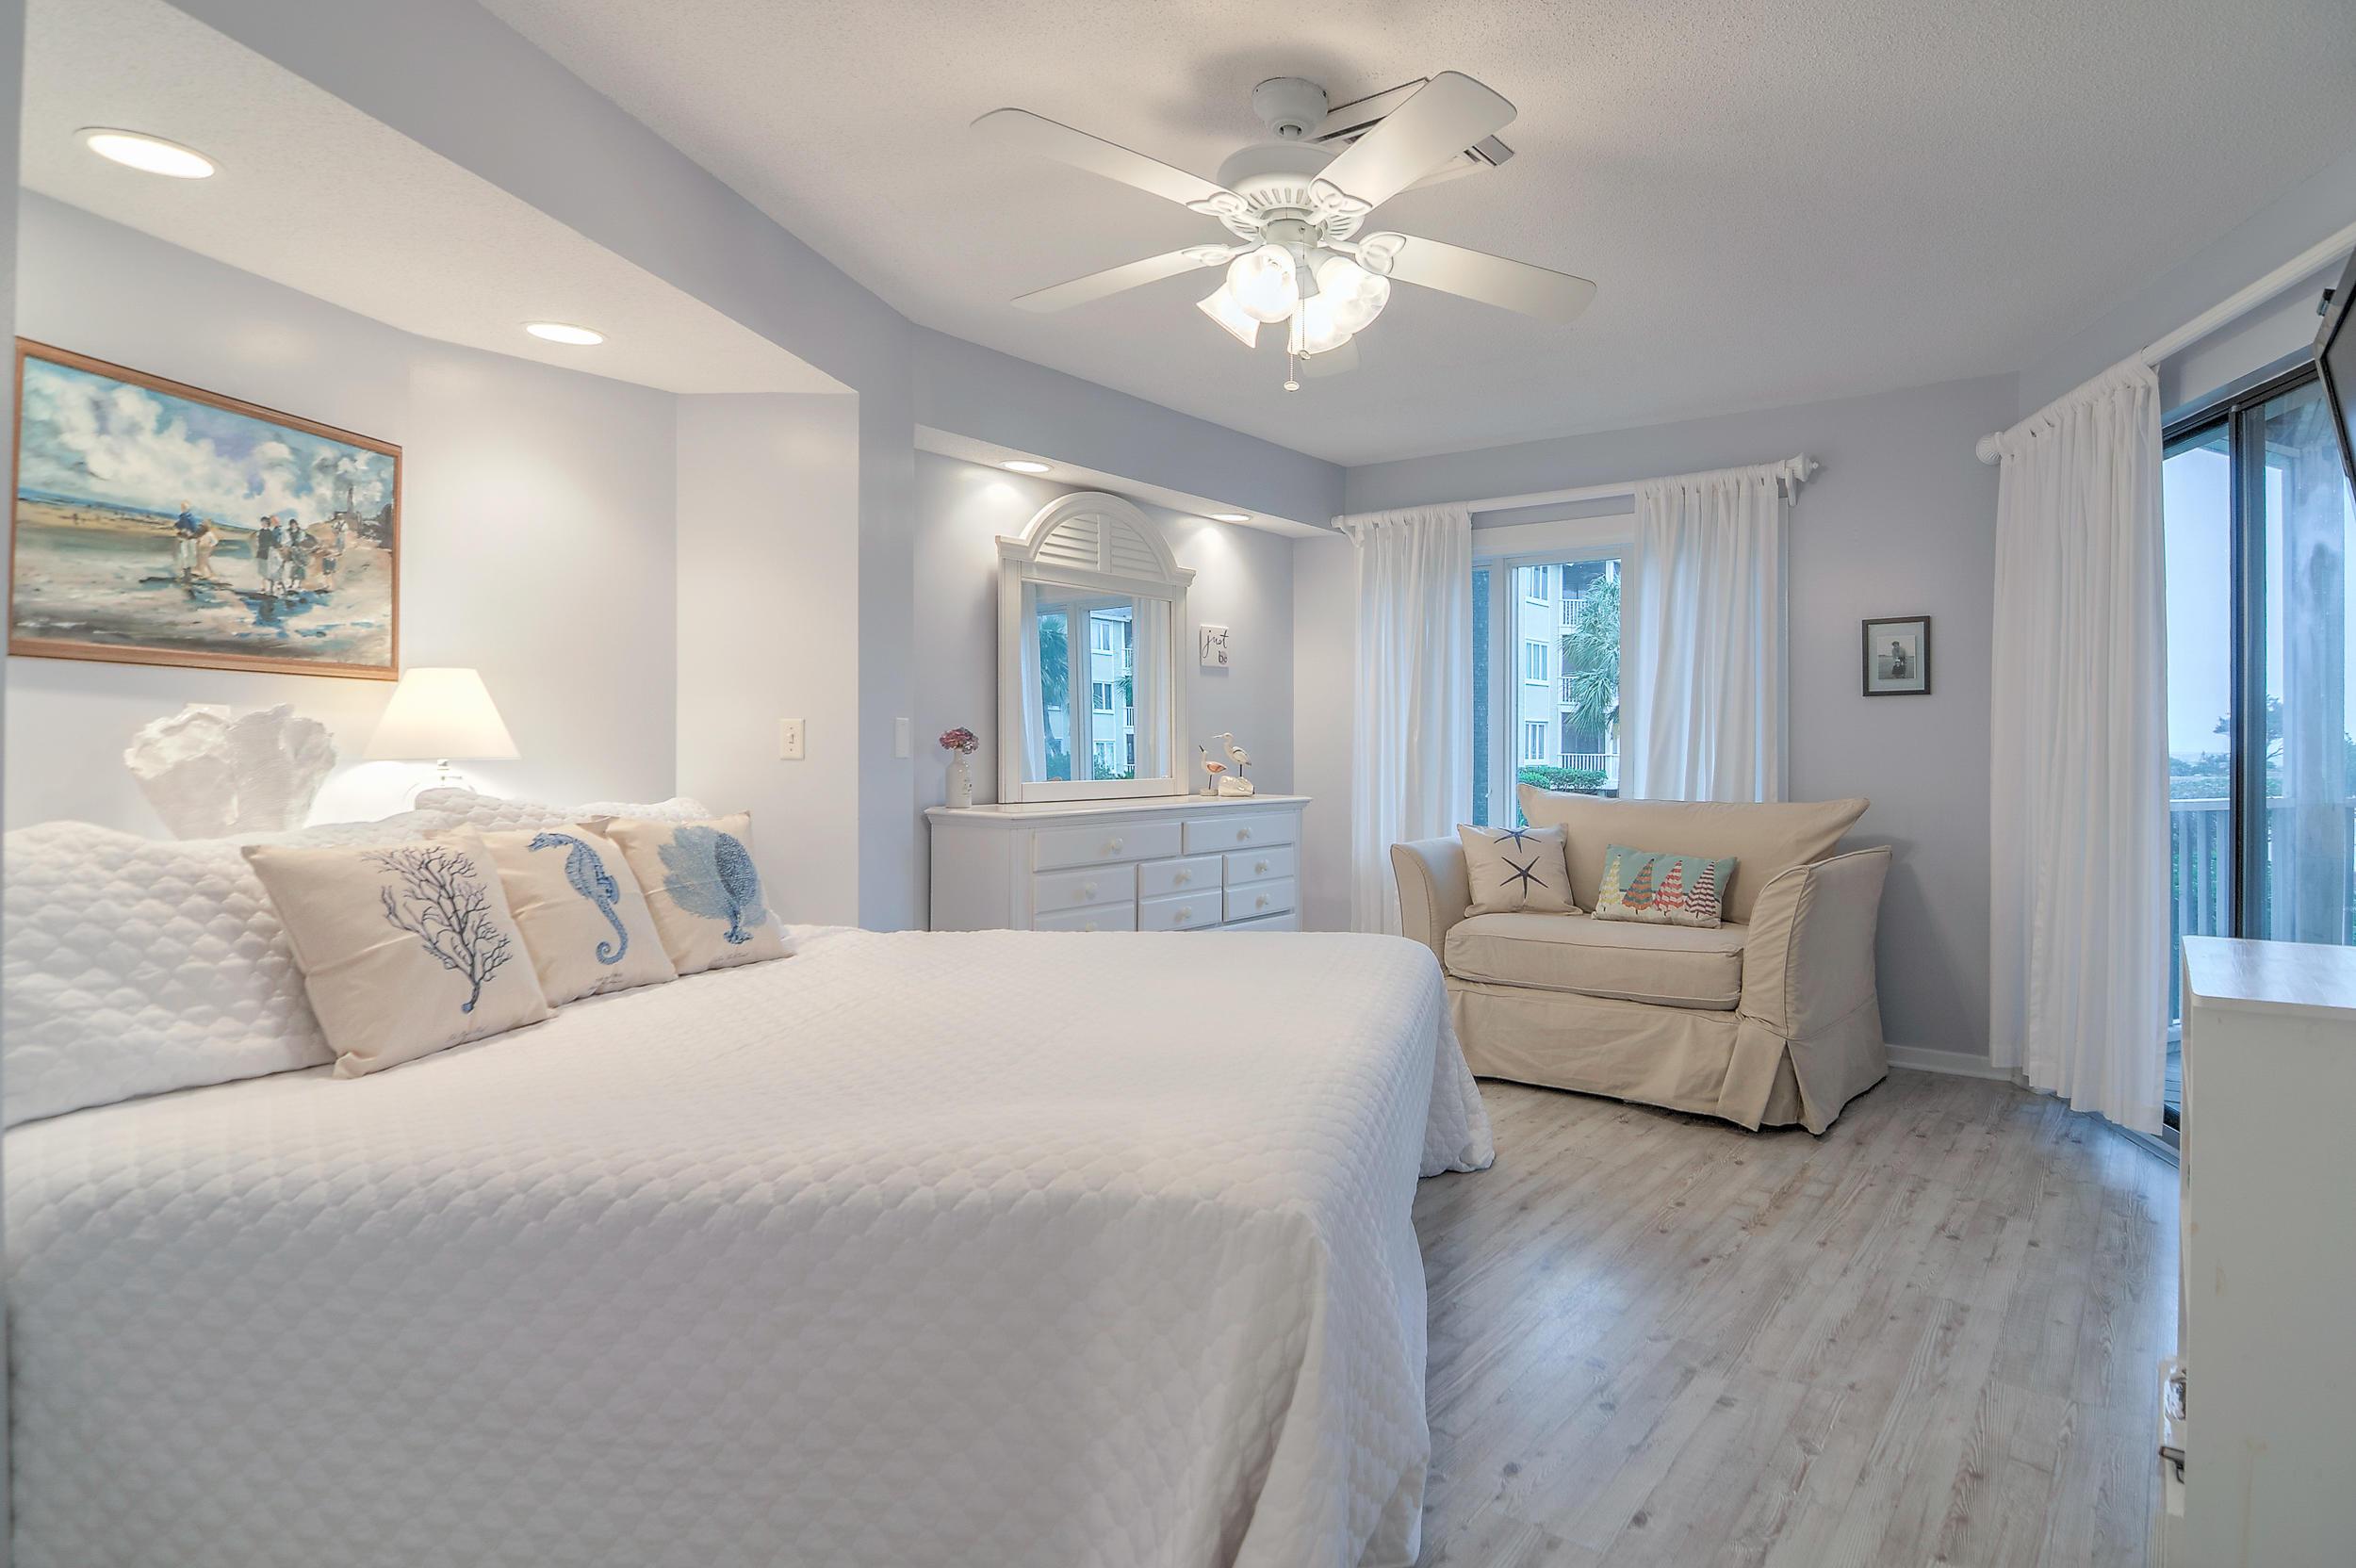 Port Ocall Homes For Sale - 103 Port O Call, Isle of Palms, SC - 1